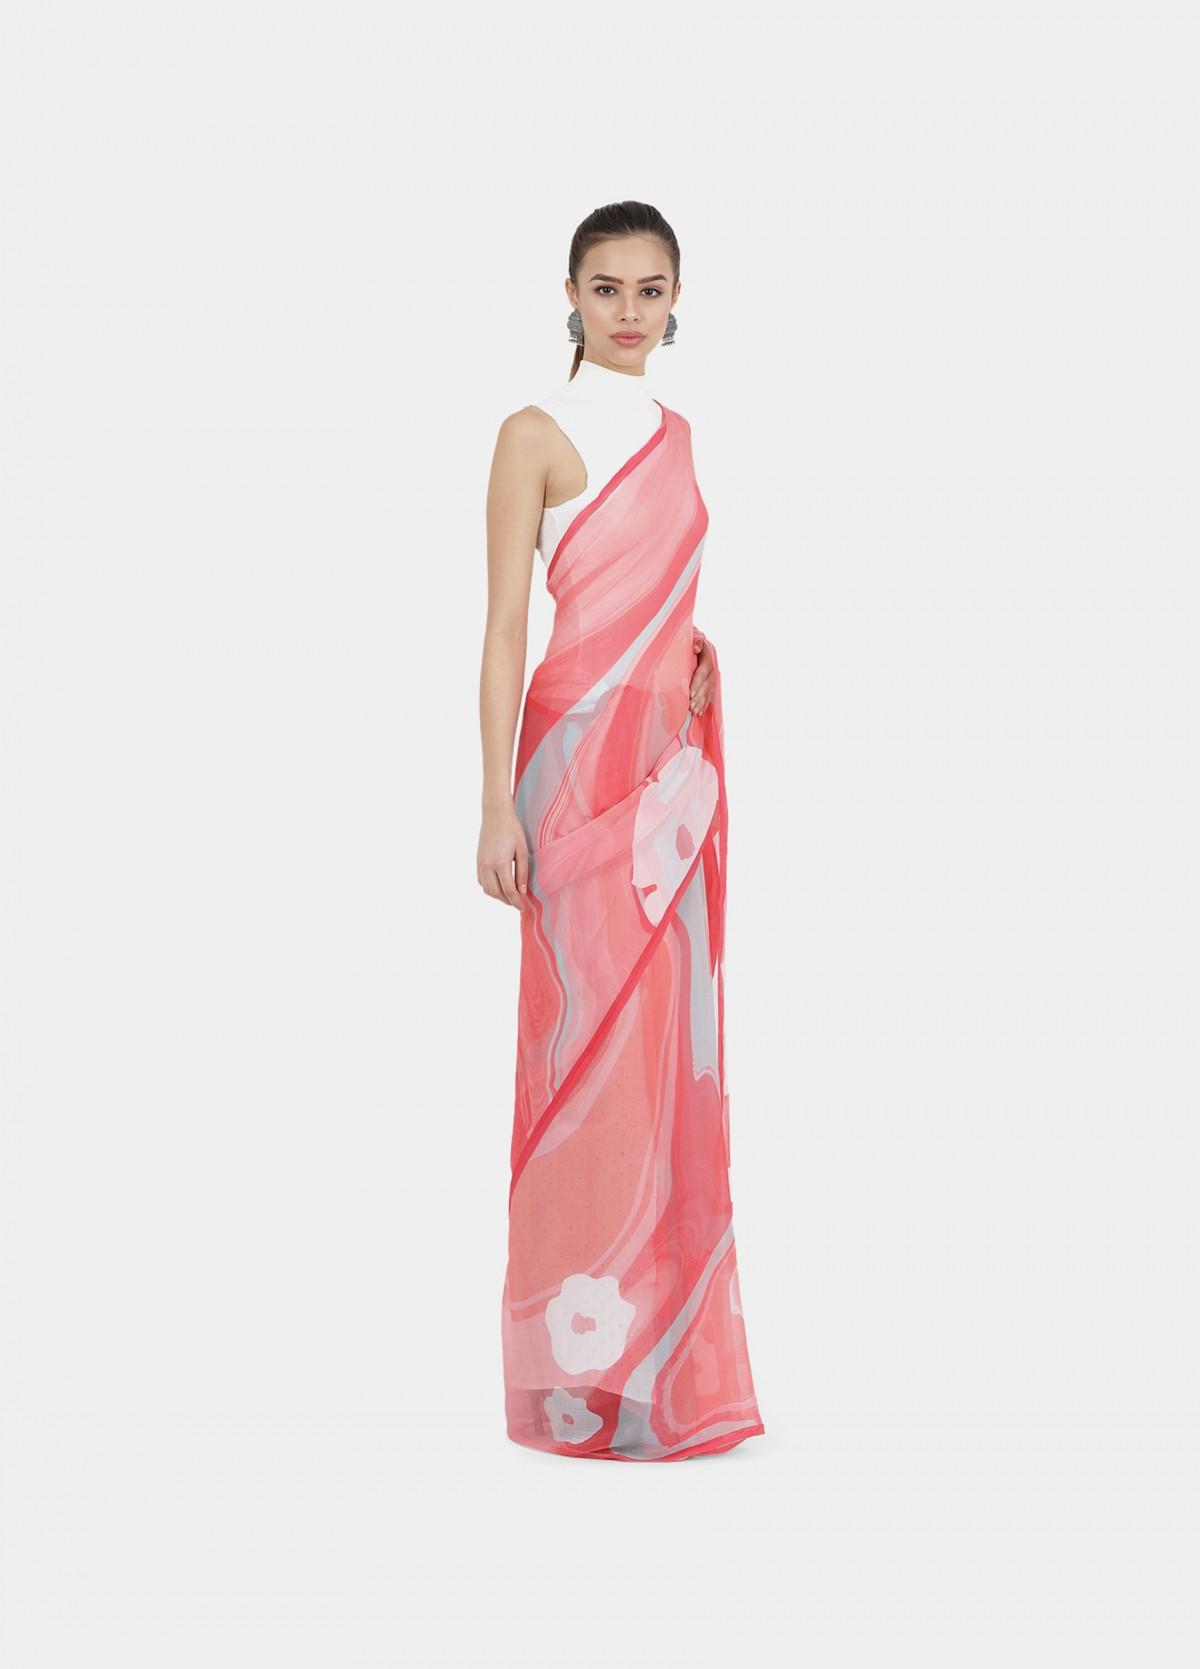 The Sakura Sari